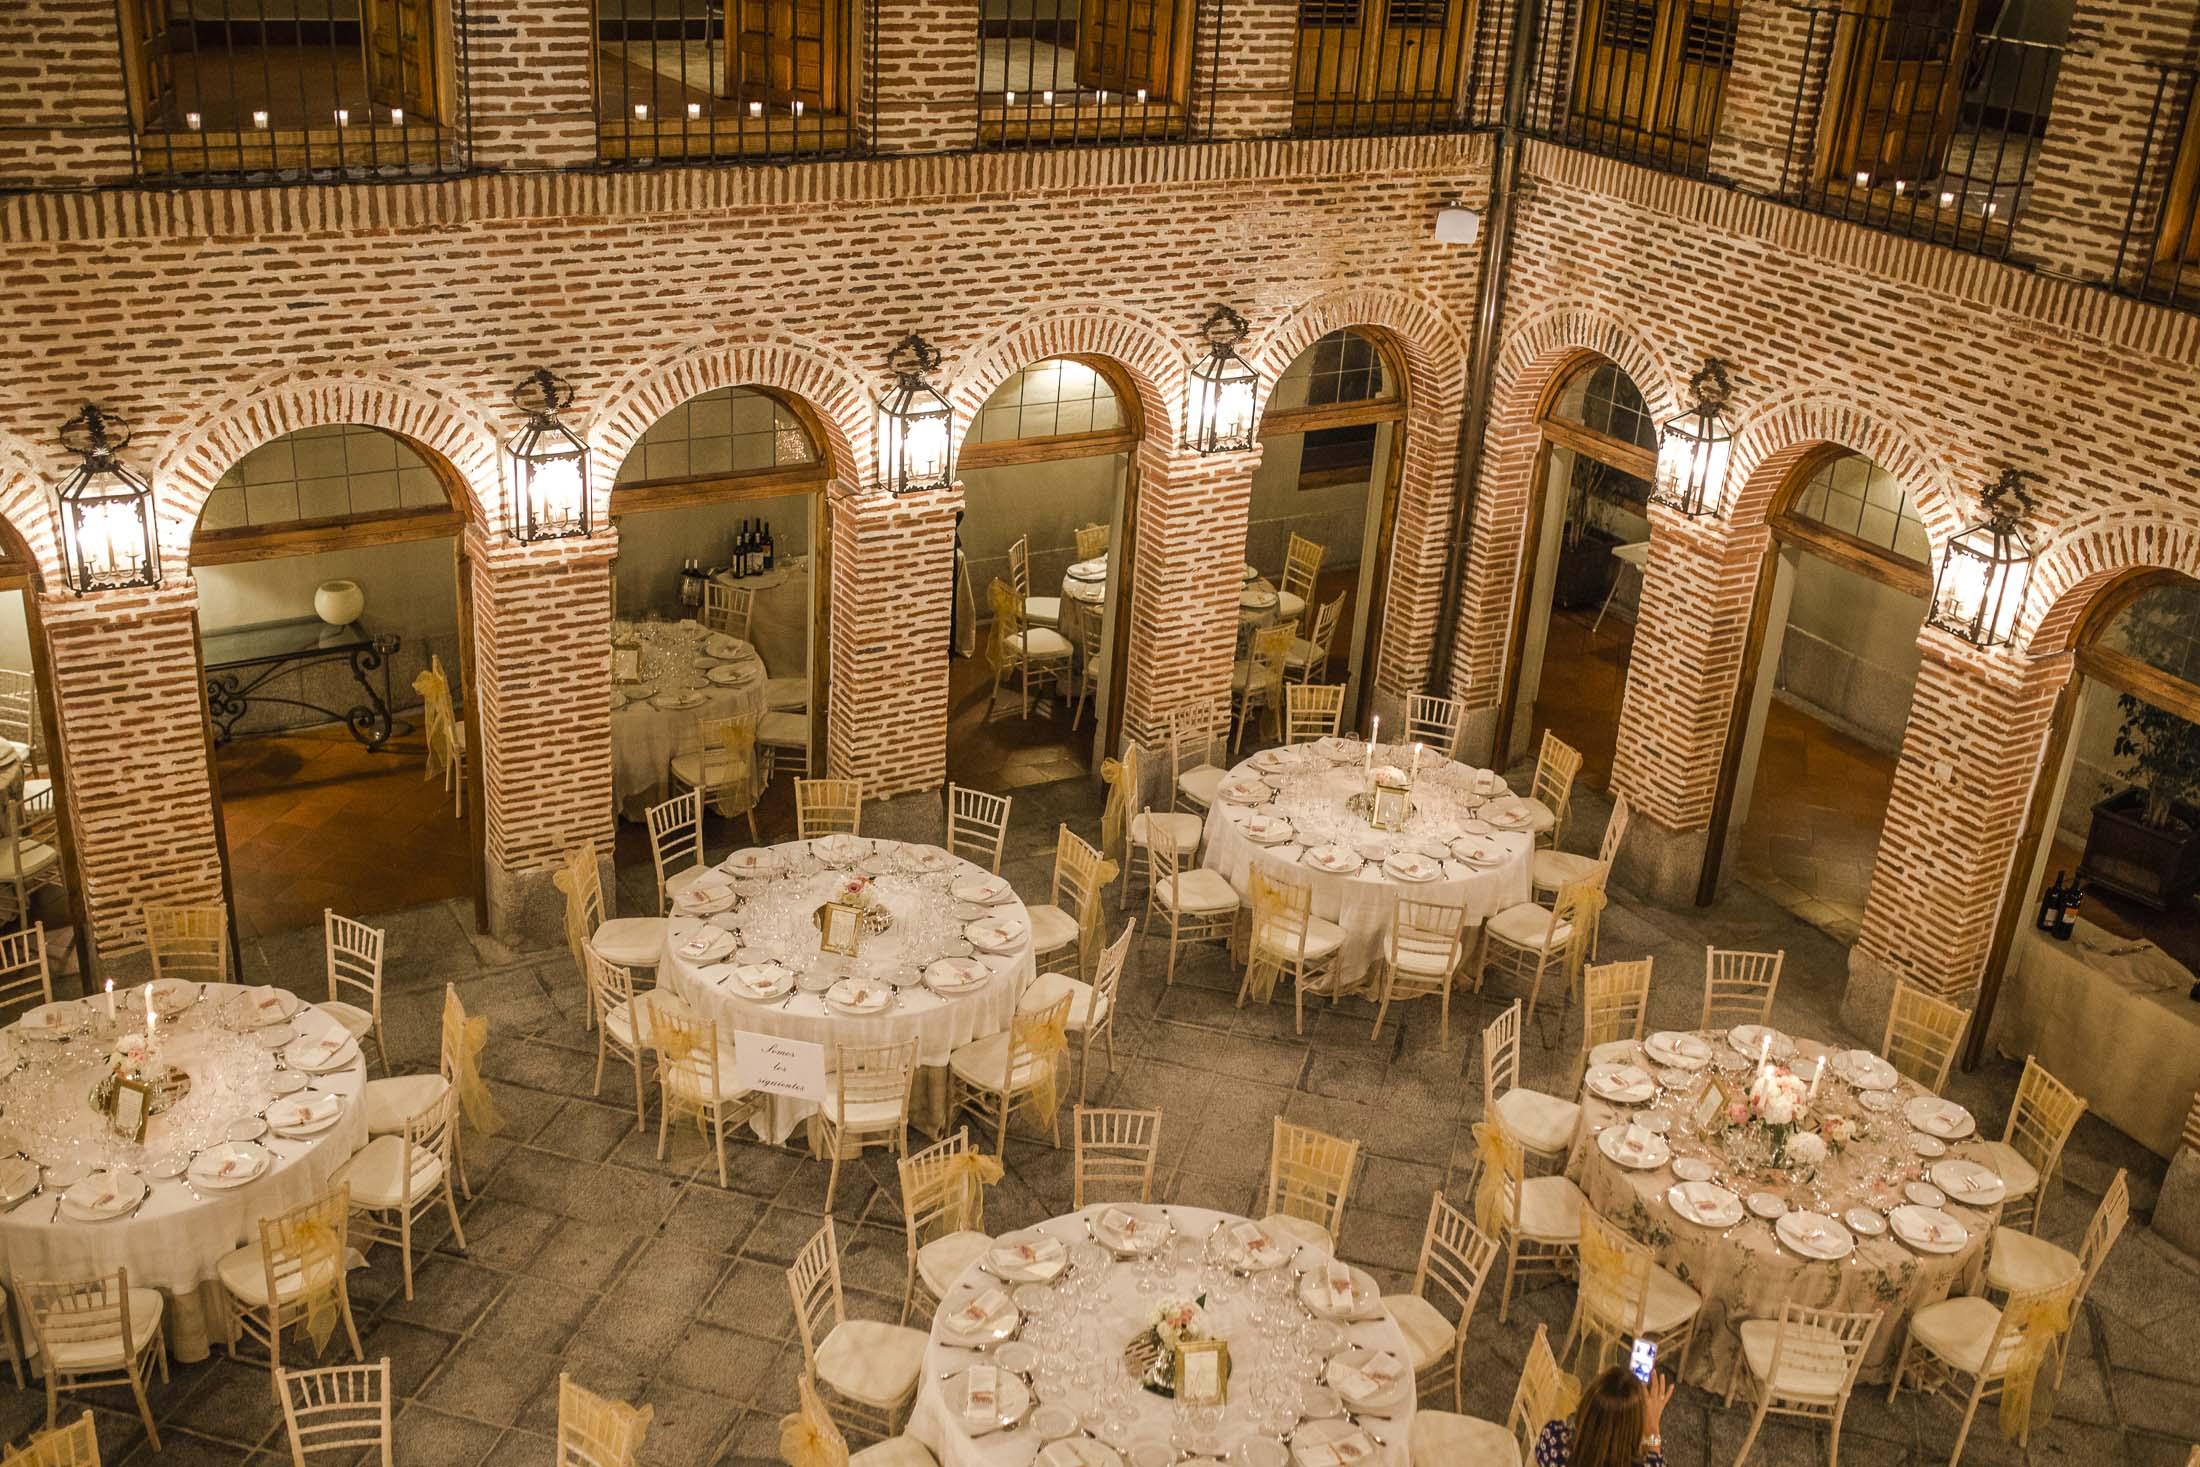 decoración cena boda romántica velas sillas tiffany